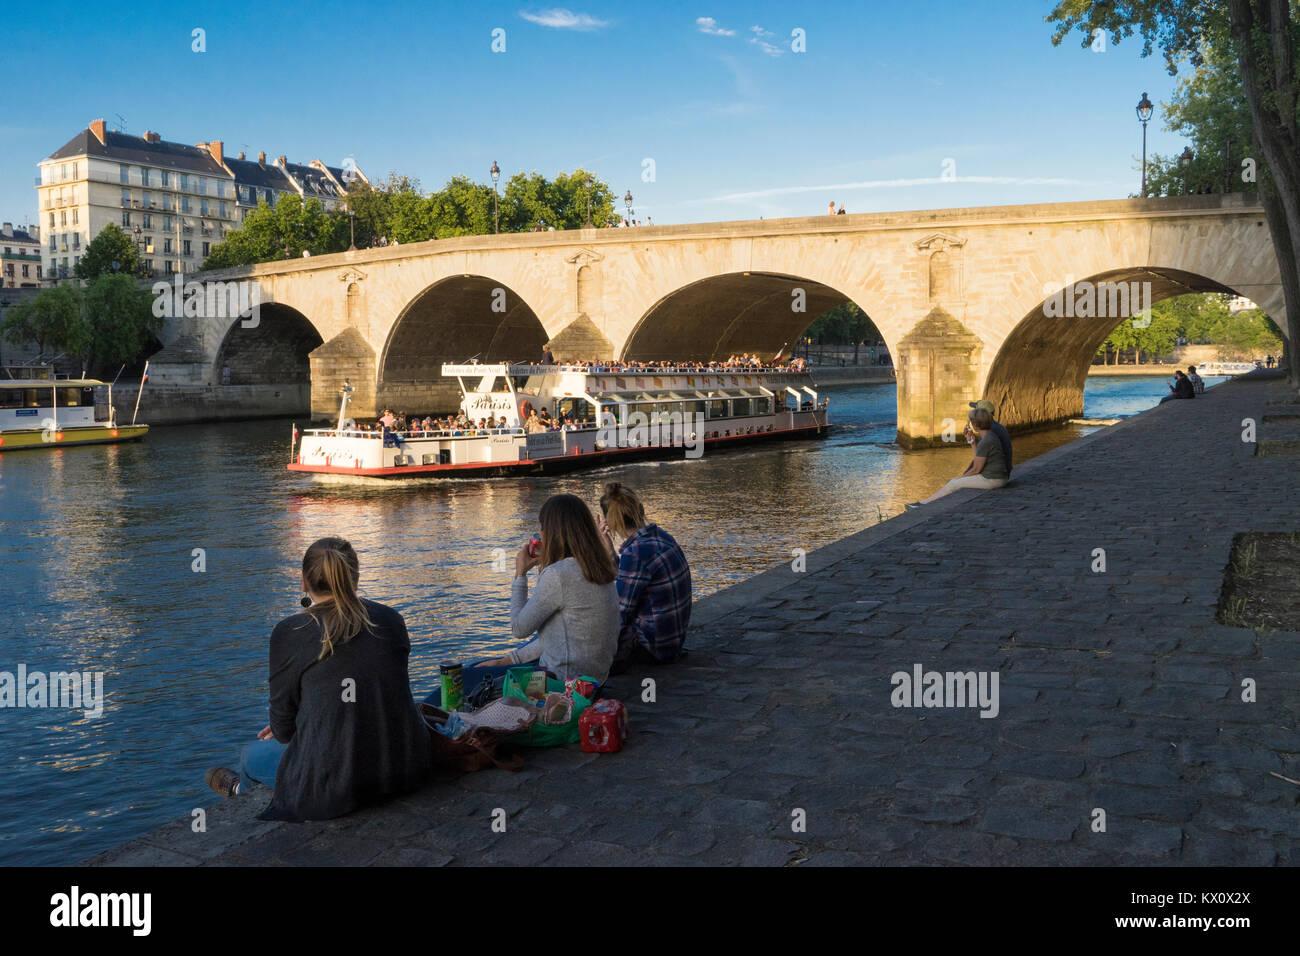 France, Paris (75), Woman picnicking on the Quai de Bourbon with the  Pont Marie behind - Stock Image